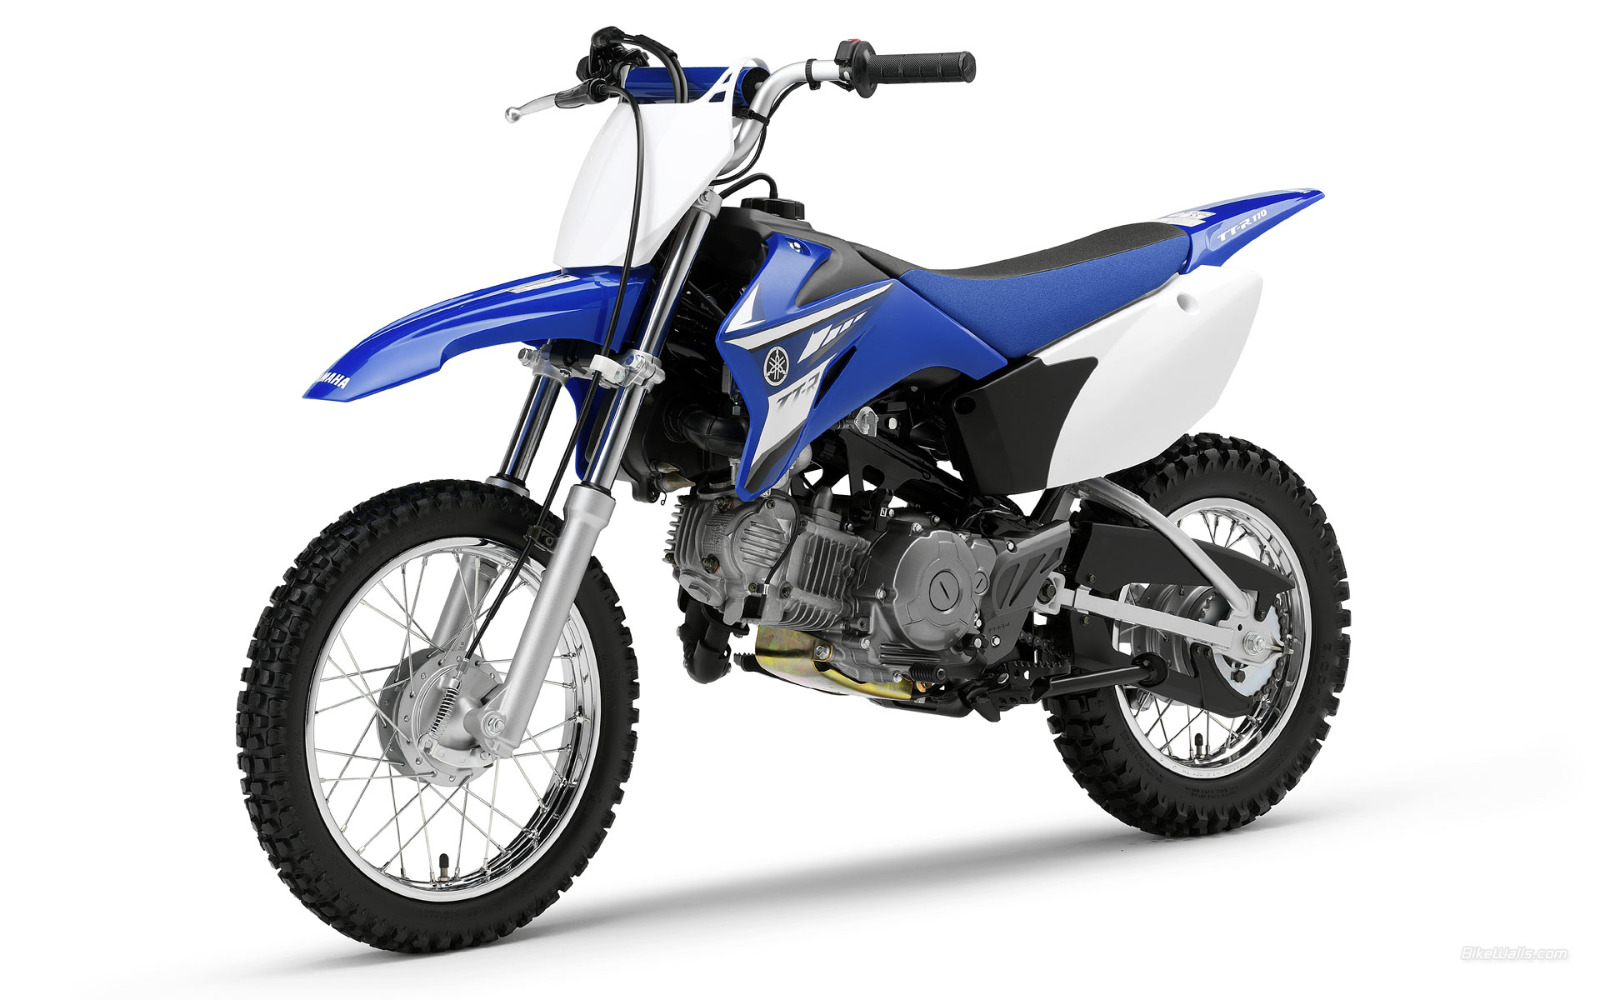 Ttr 110 style plastics graphics seat tank 125 140 150 for Yamaha dirt bike plastics